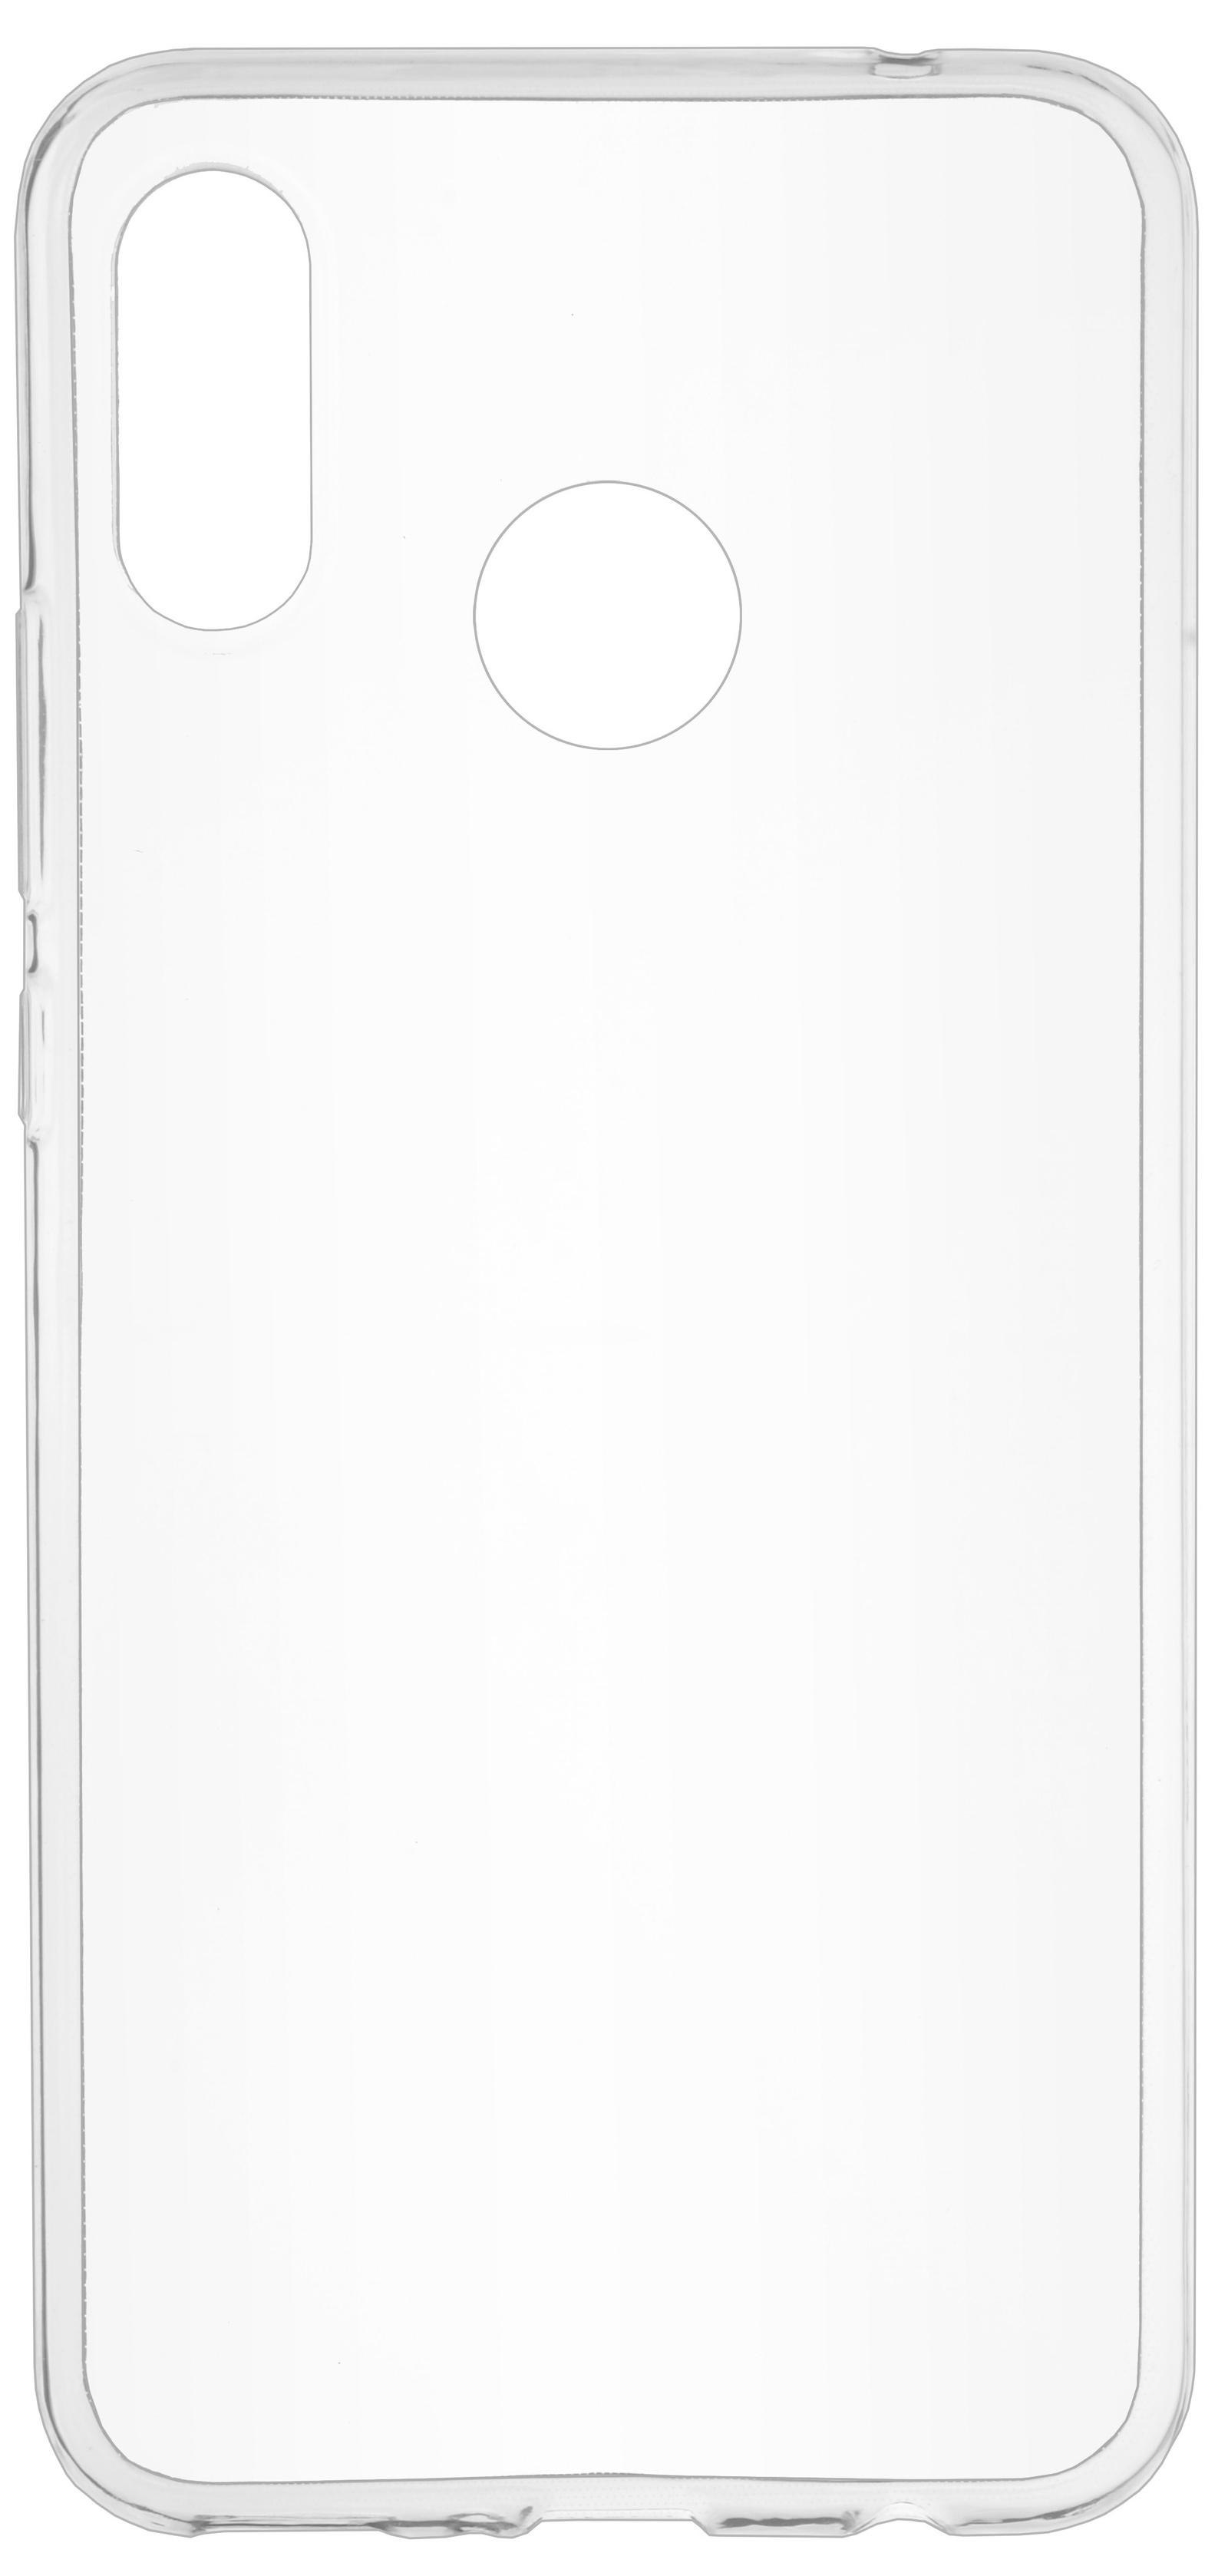 Накладка Skinbox Slim Silicone для Huawei Nova 3, 4660041406375, прозрачный цена и фото